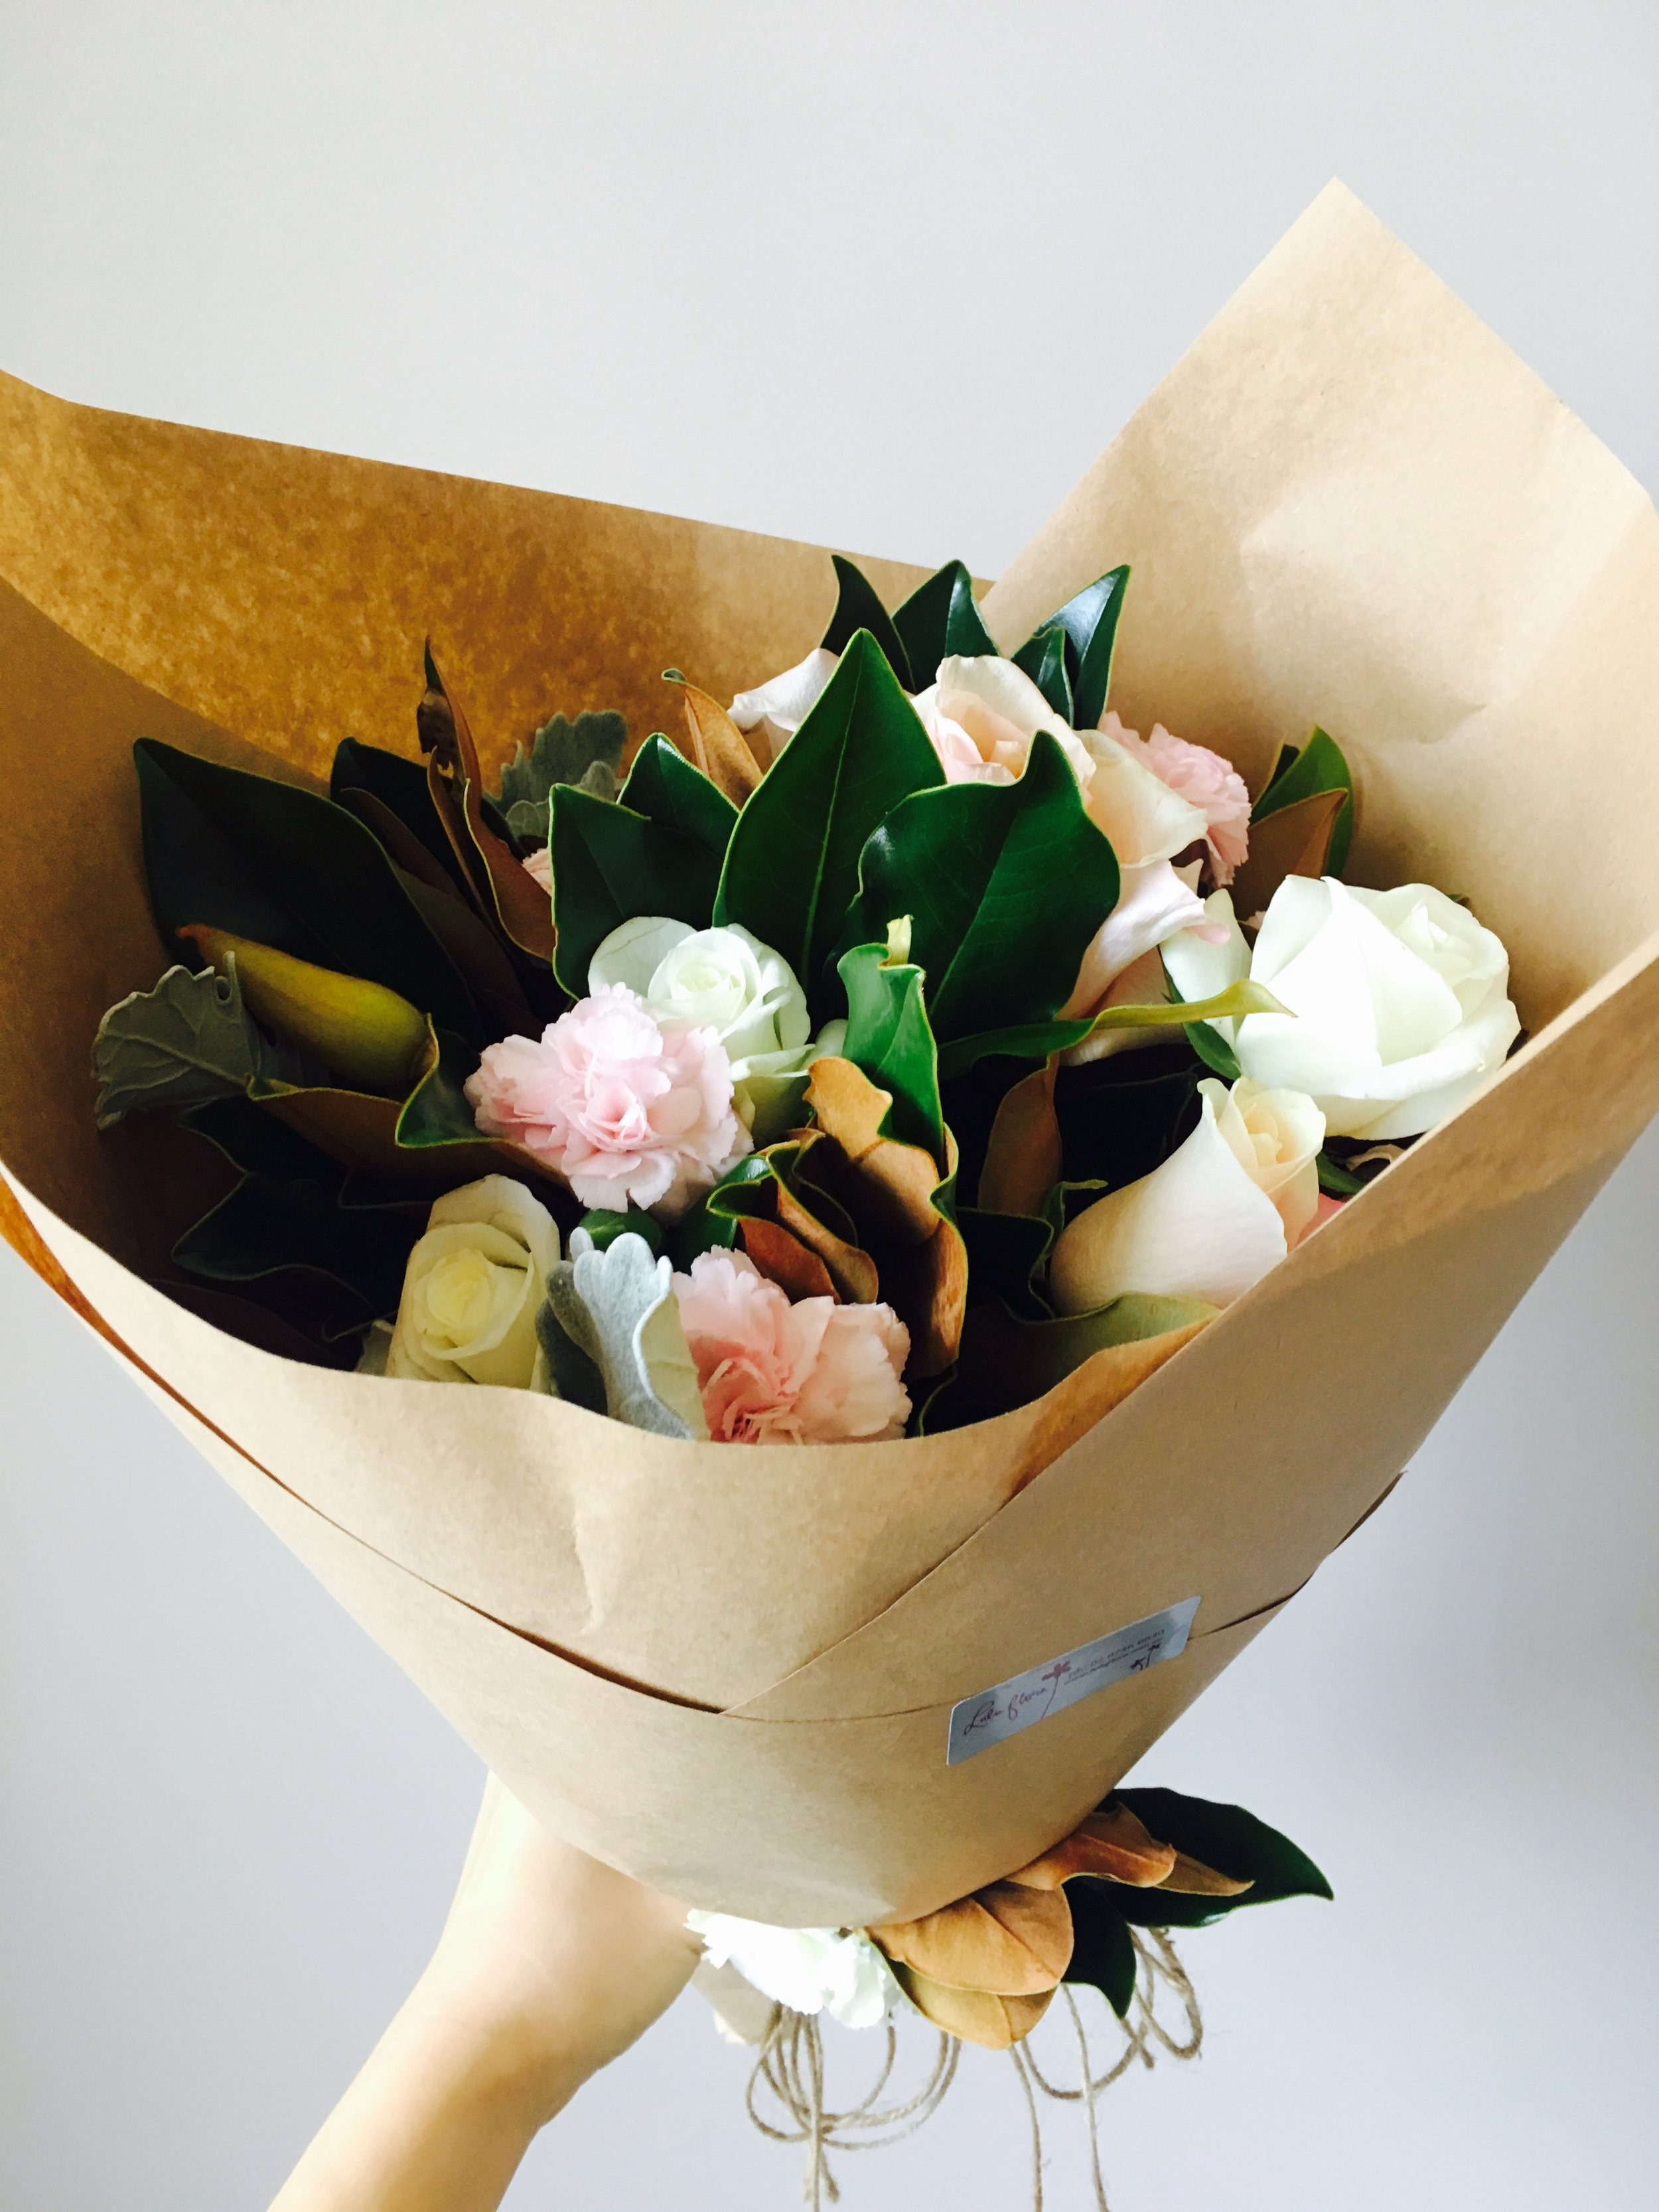 Surprise congratulatory flowers @Luluflora @inaloveyoon